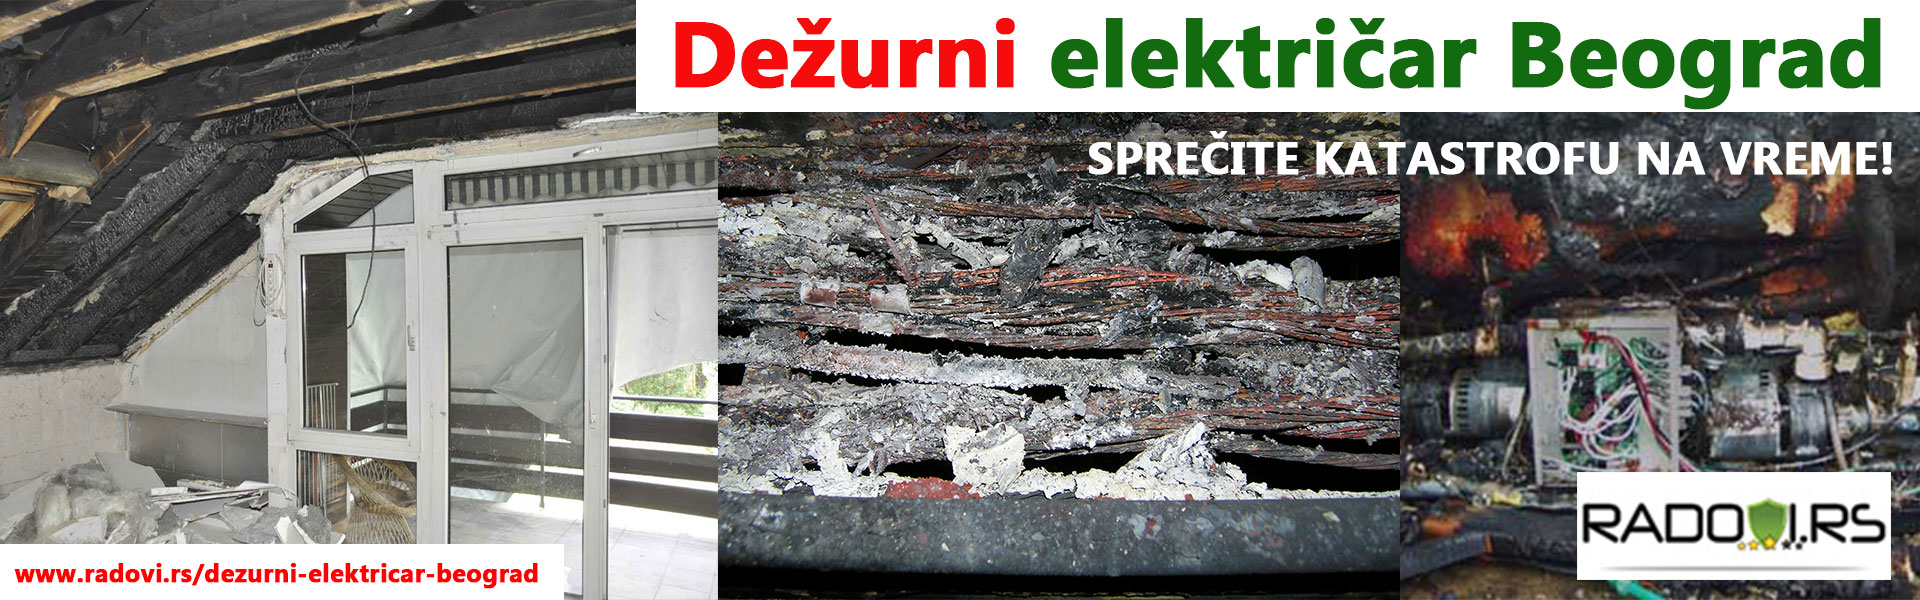 Dežurni električar Beograd - Električar Beograd Tim - Radovi.rs